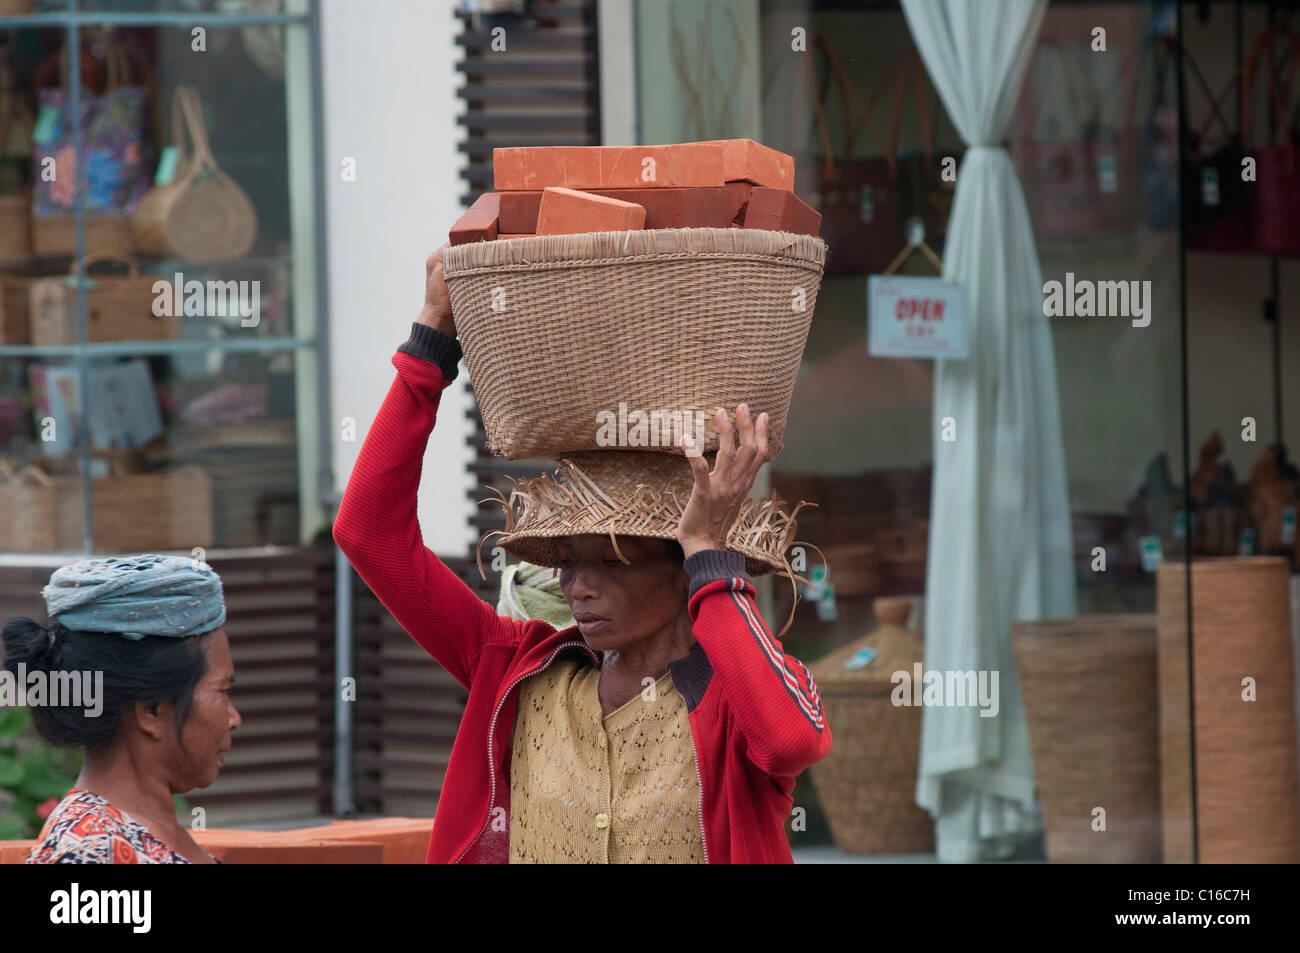 Woman carrying basket of bricks on her head in Ubud Bali - Stock Image